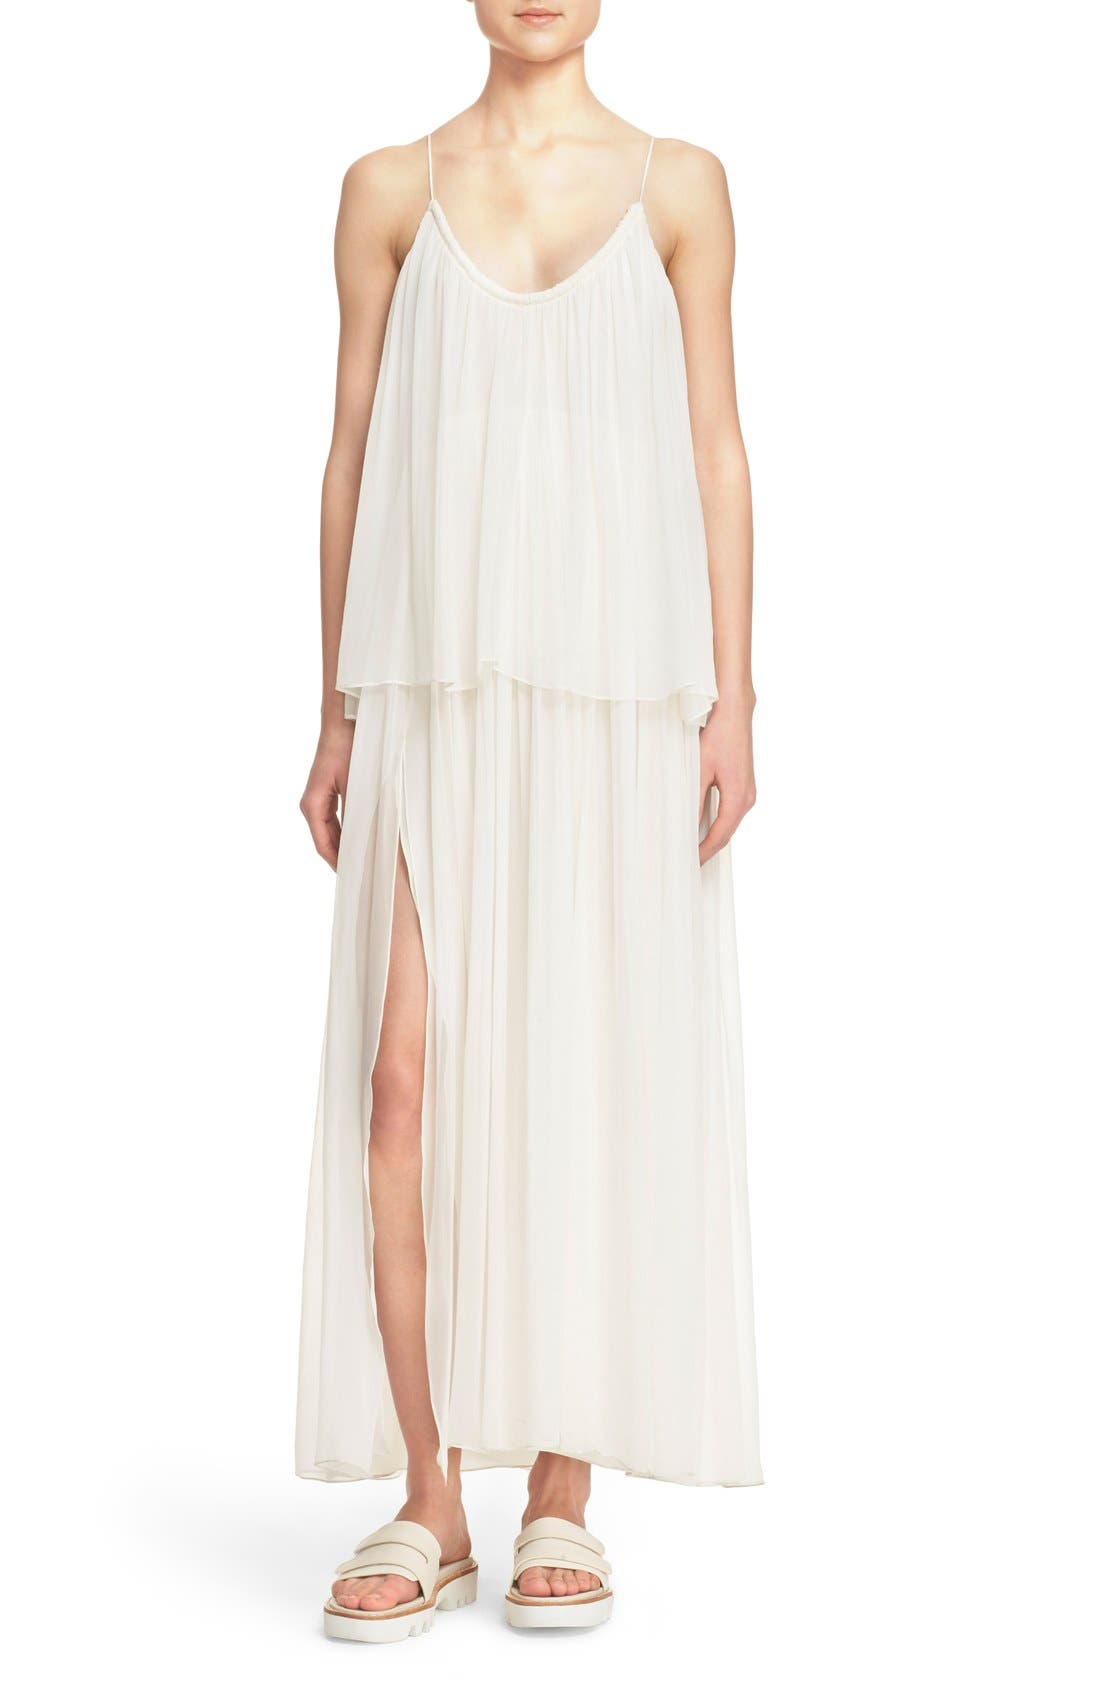 Alternate Image 1 Selected - Elizabeth and James 'Mael' Blouson Silk Maxi Dress